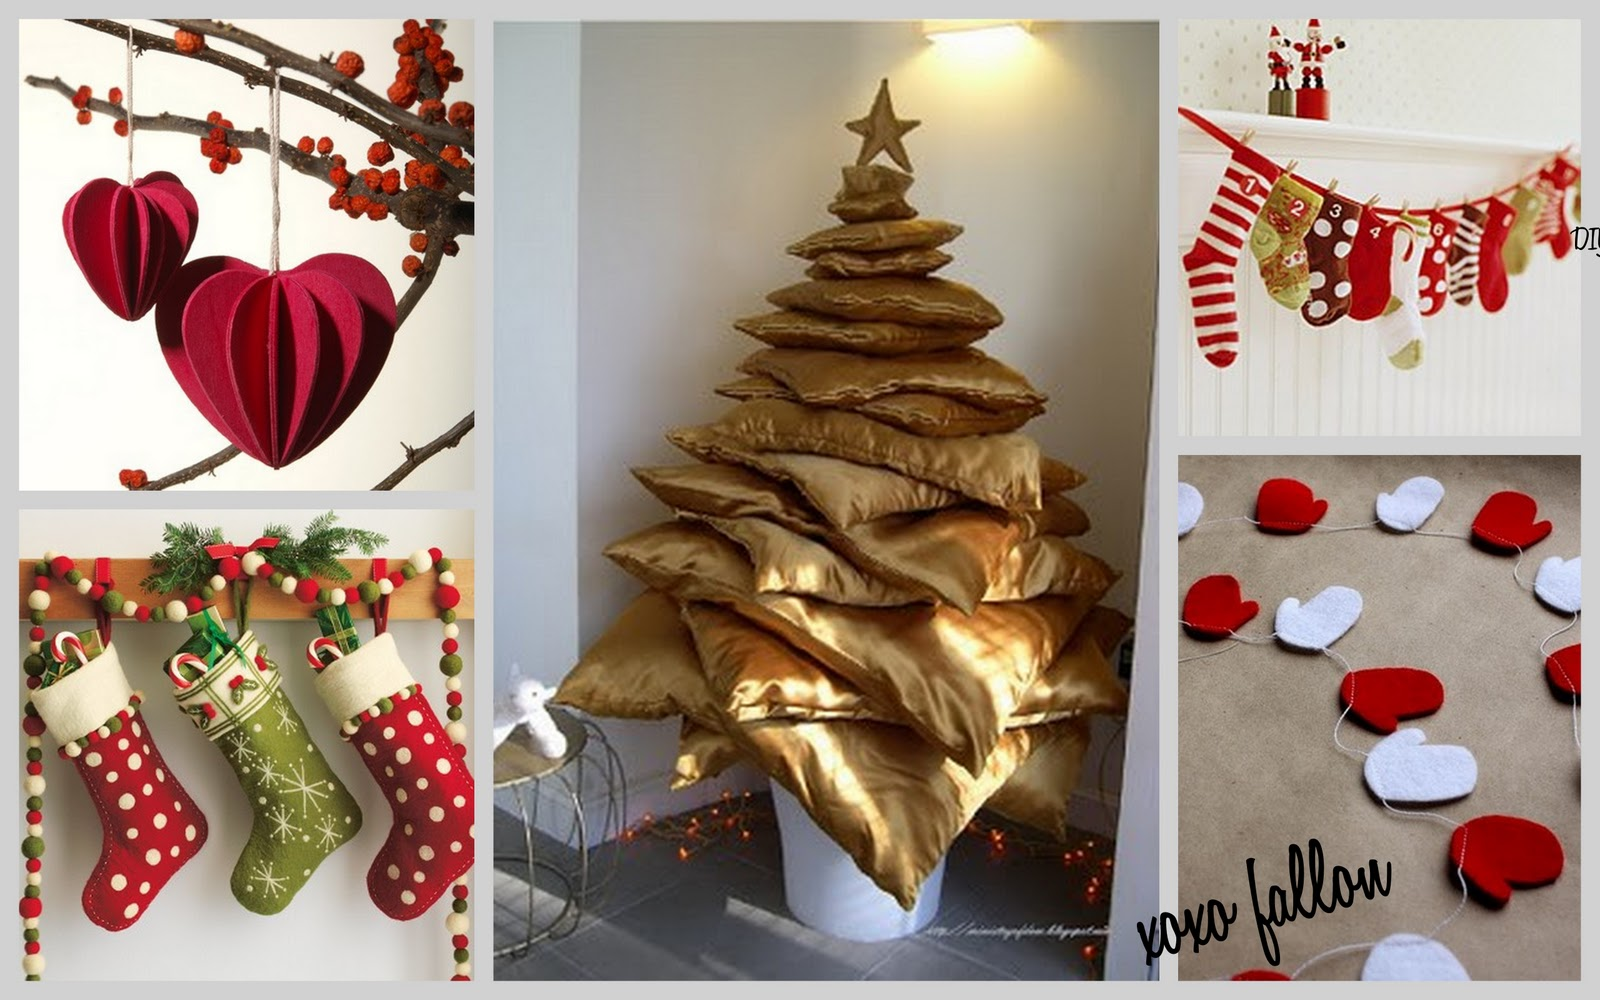 Fairytale Wishes And Dreams: DIY Christmas Decor